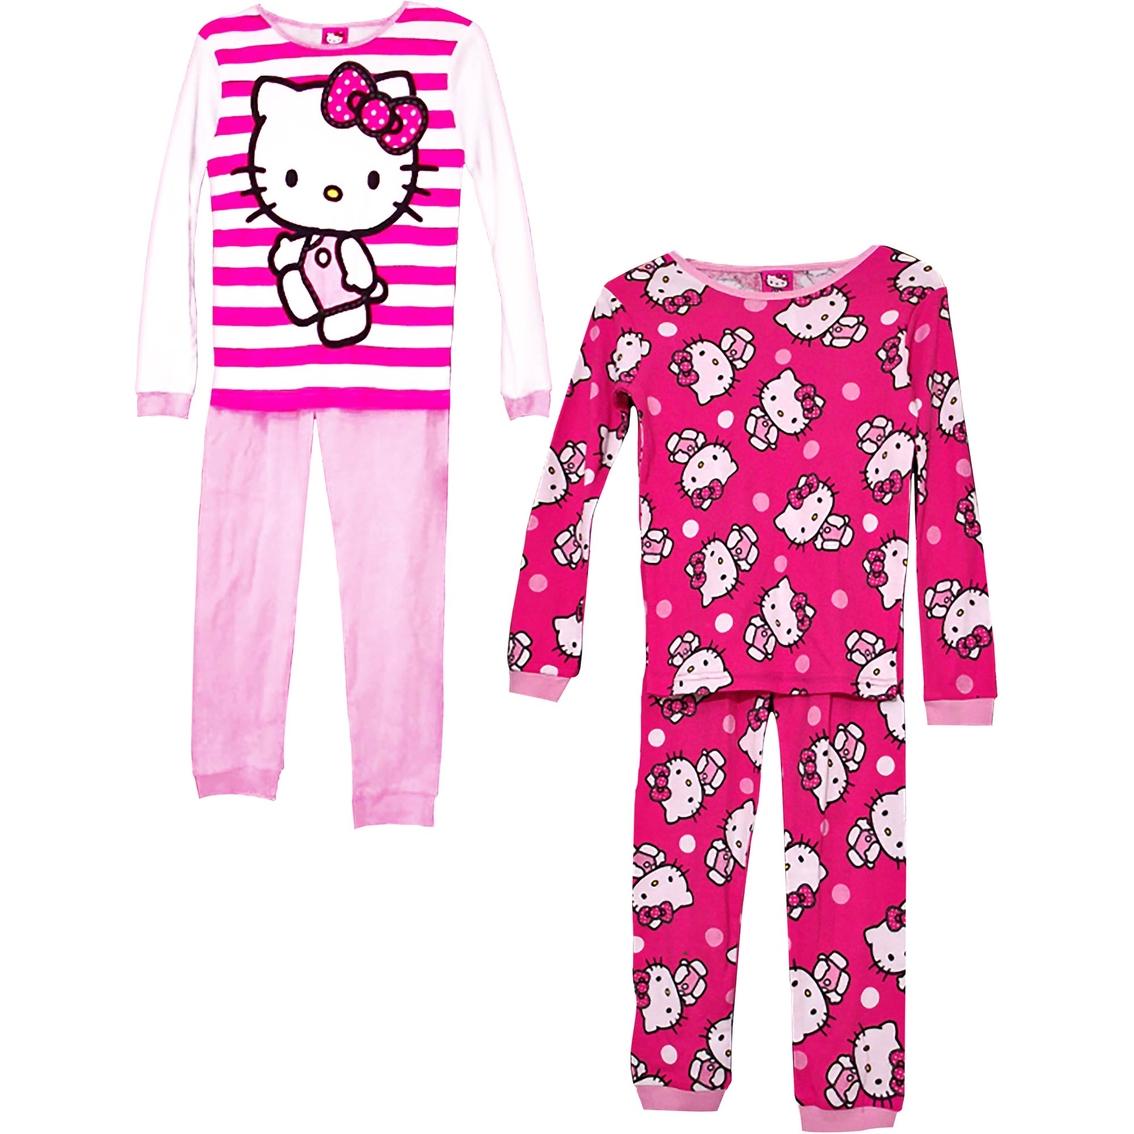 AME Sleepwear Little Girls Hello Kitty Pajama Set